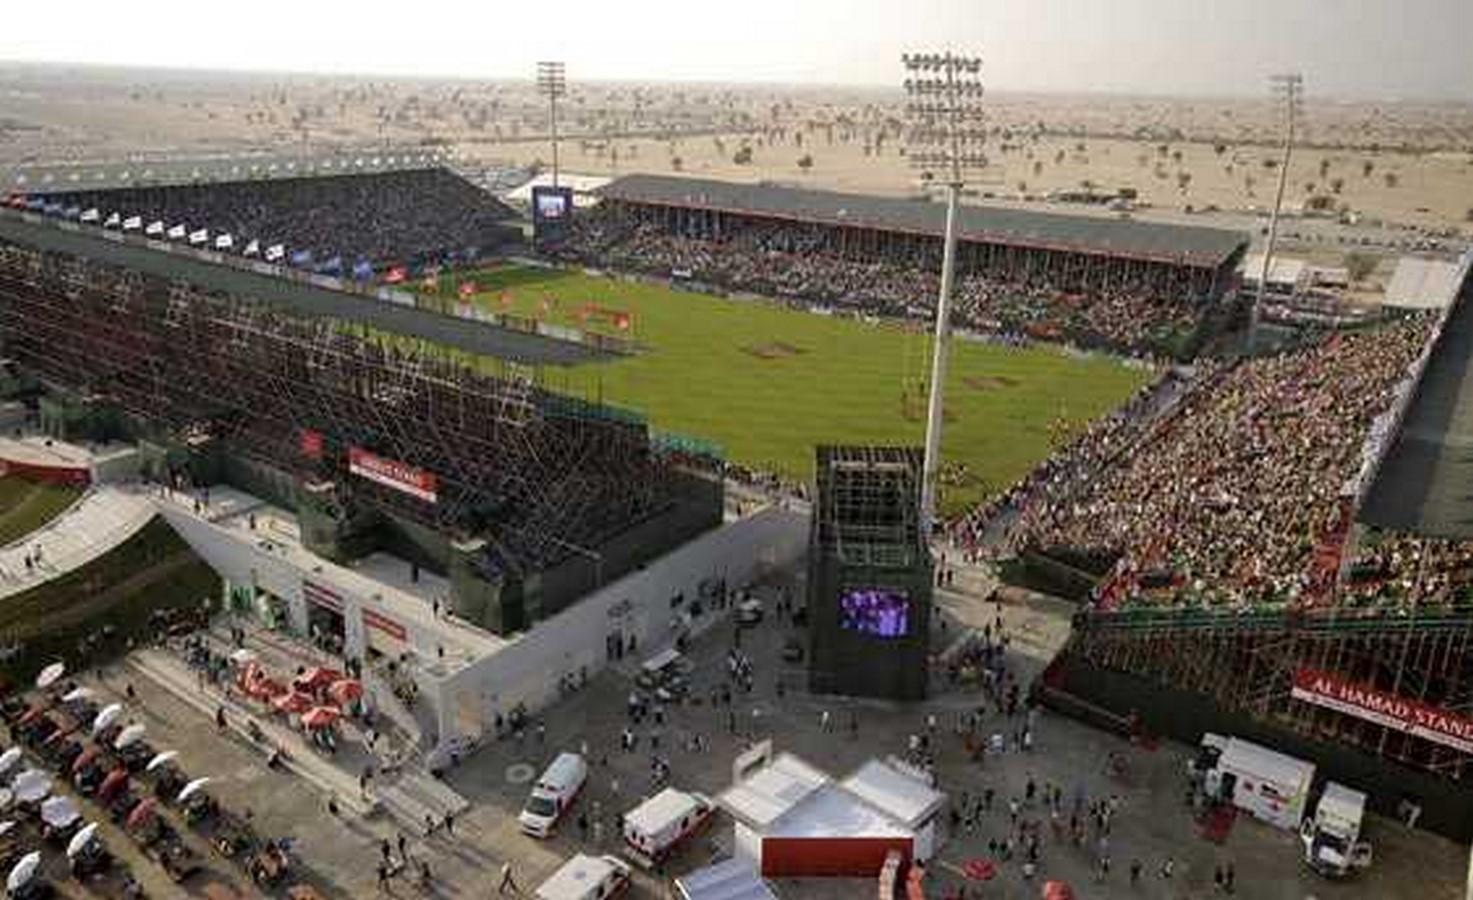 The Stevens Stadium, Dubai - Sheet1